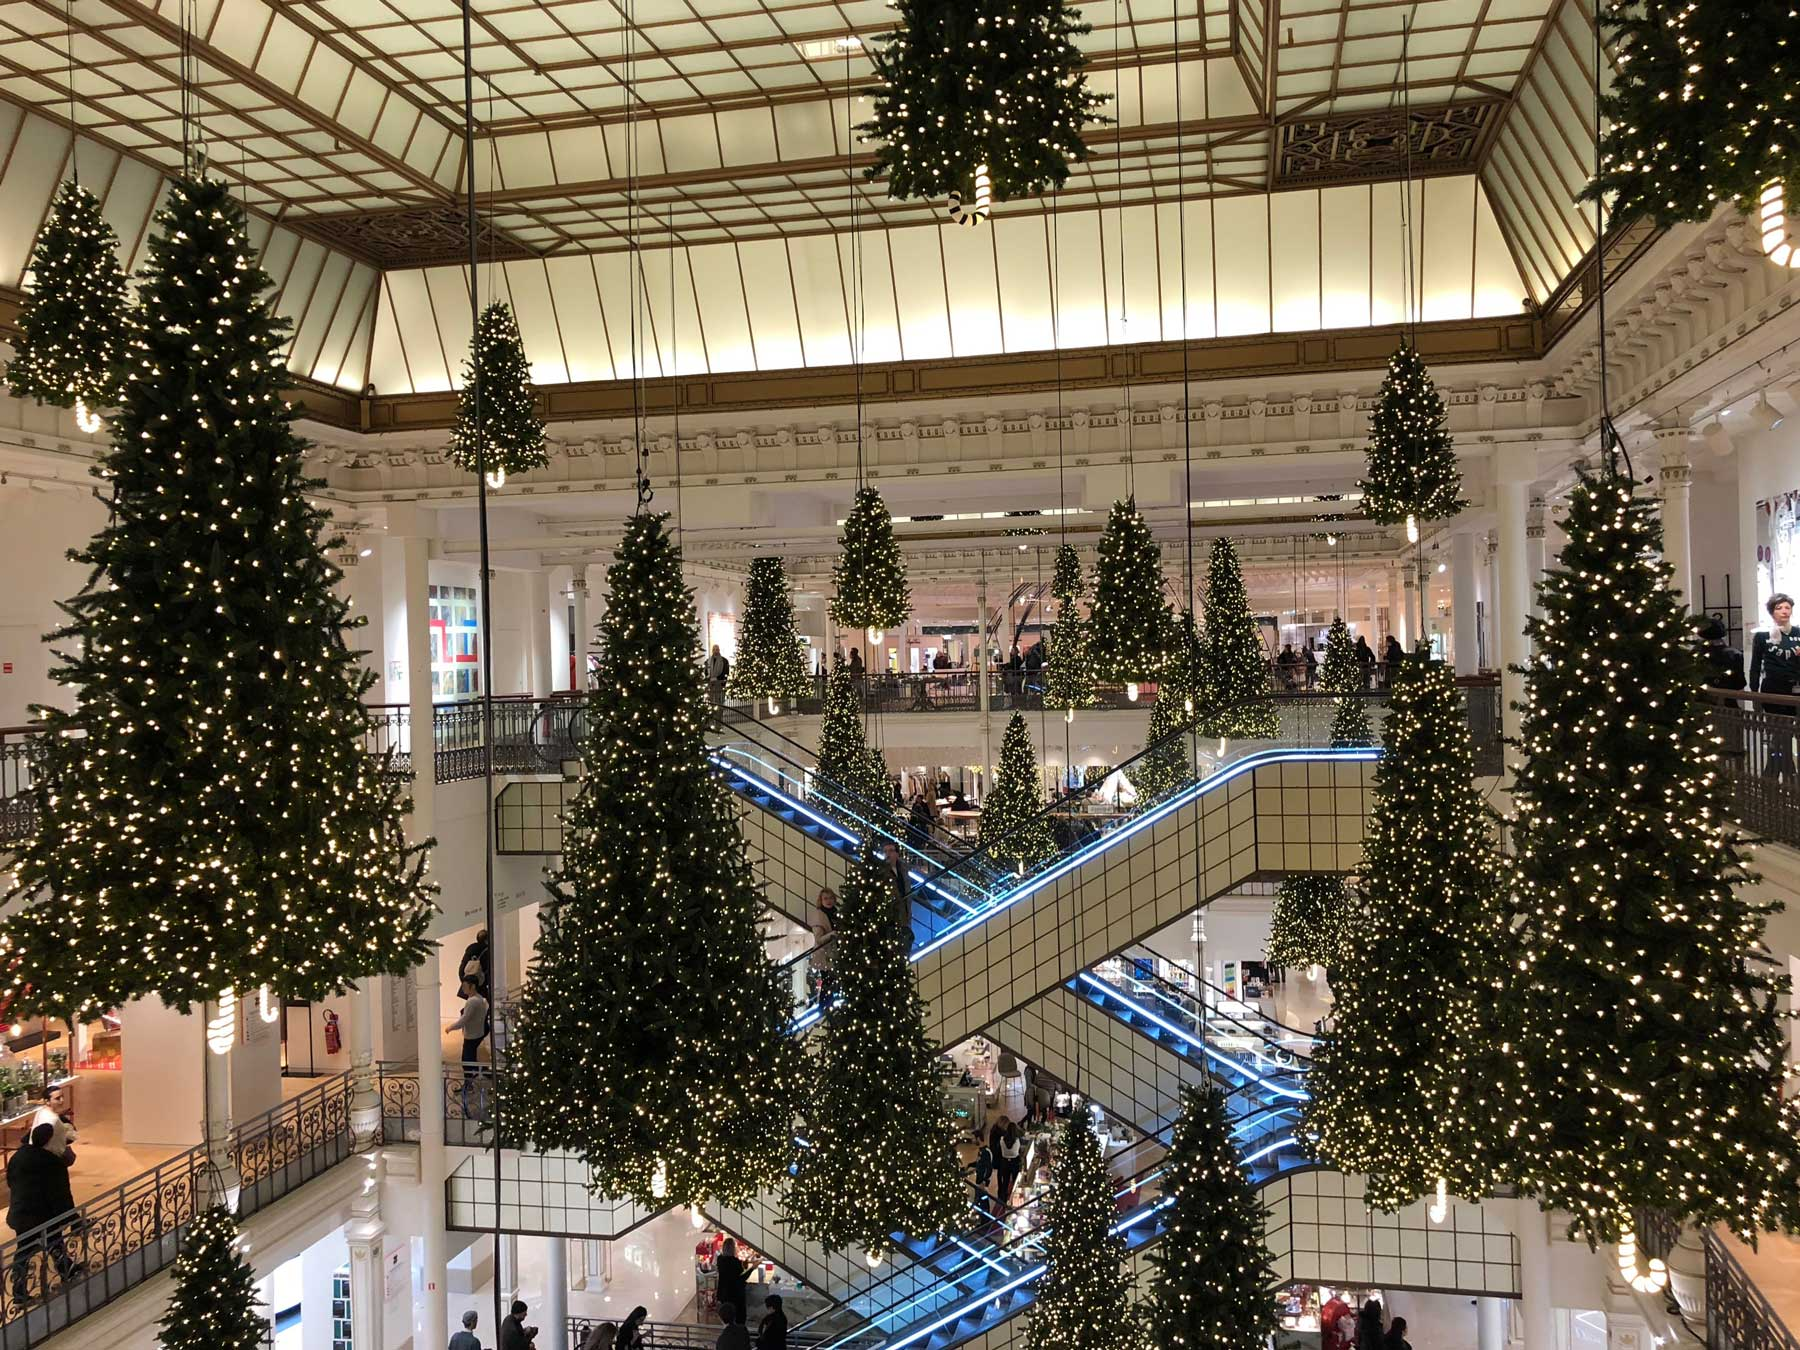 le-bon-marche-christmas-trees-noel-suspended